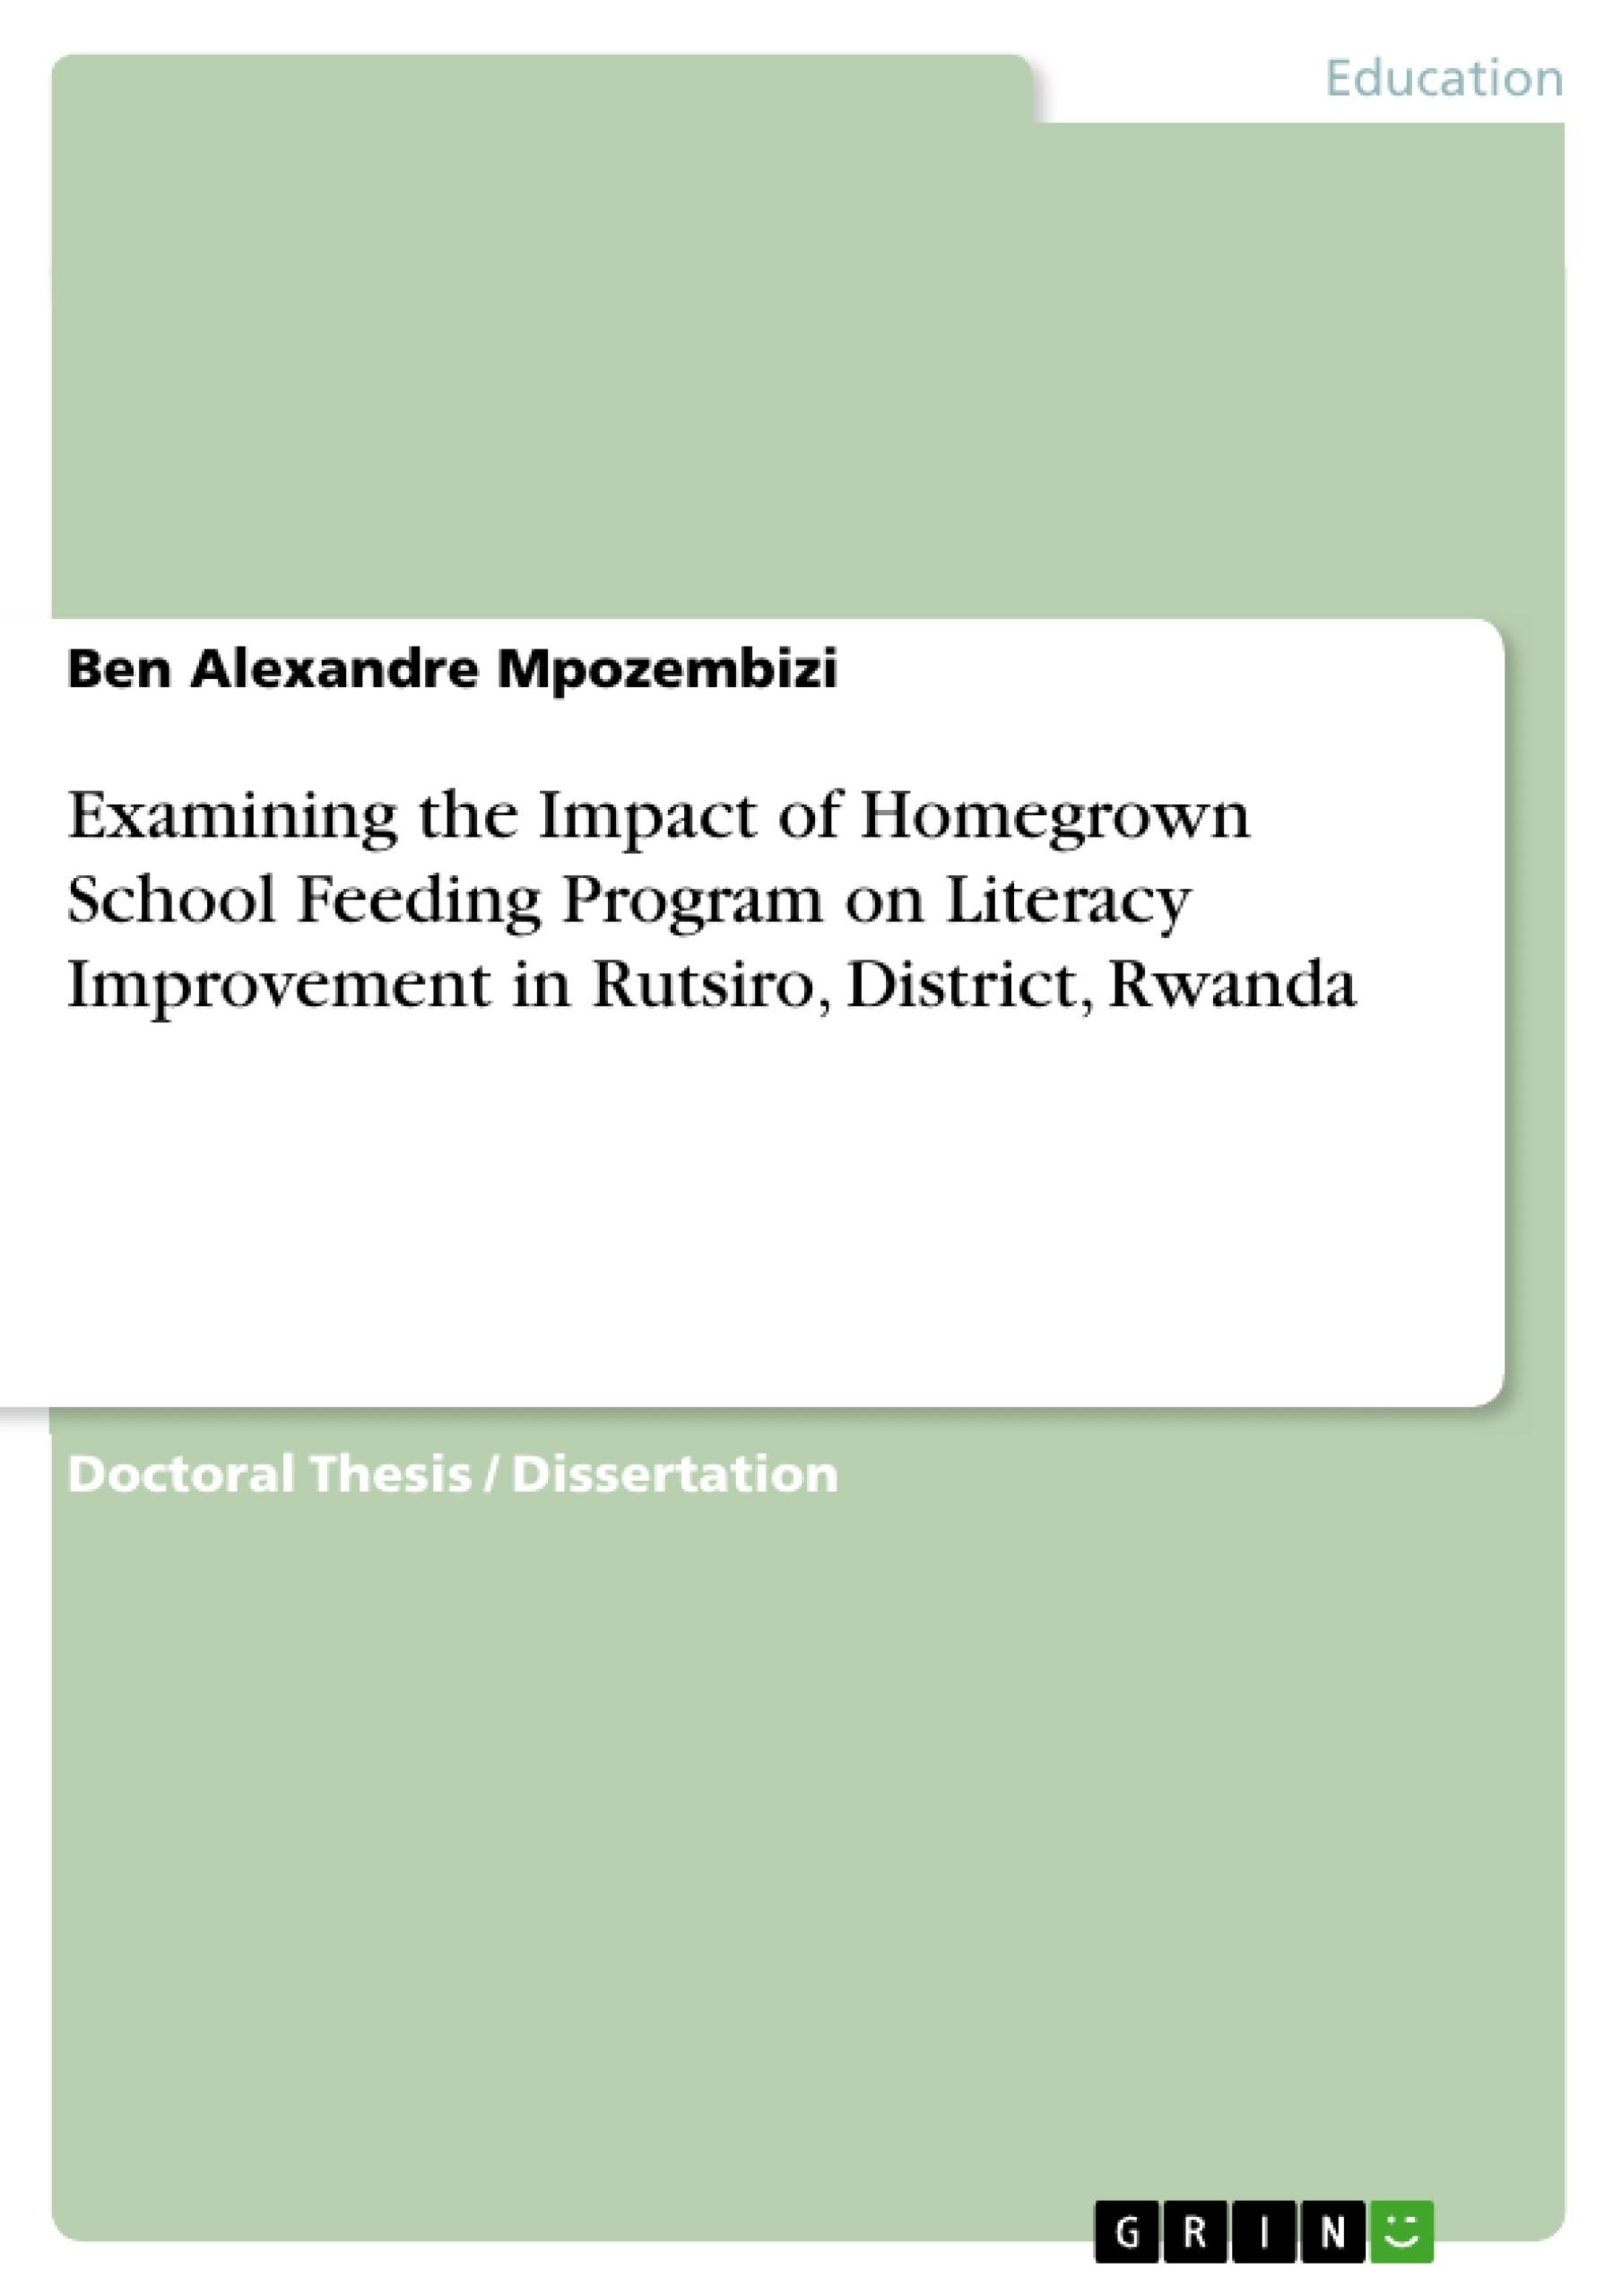 Title: Examining the Impact of Homegrown School Feeding Program on Literacy Improvement in Rutsiro, District, Rwanda